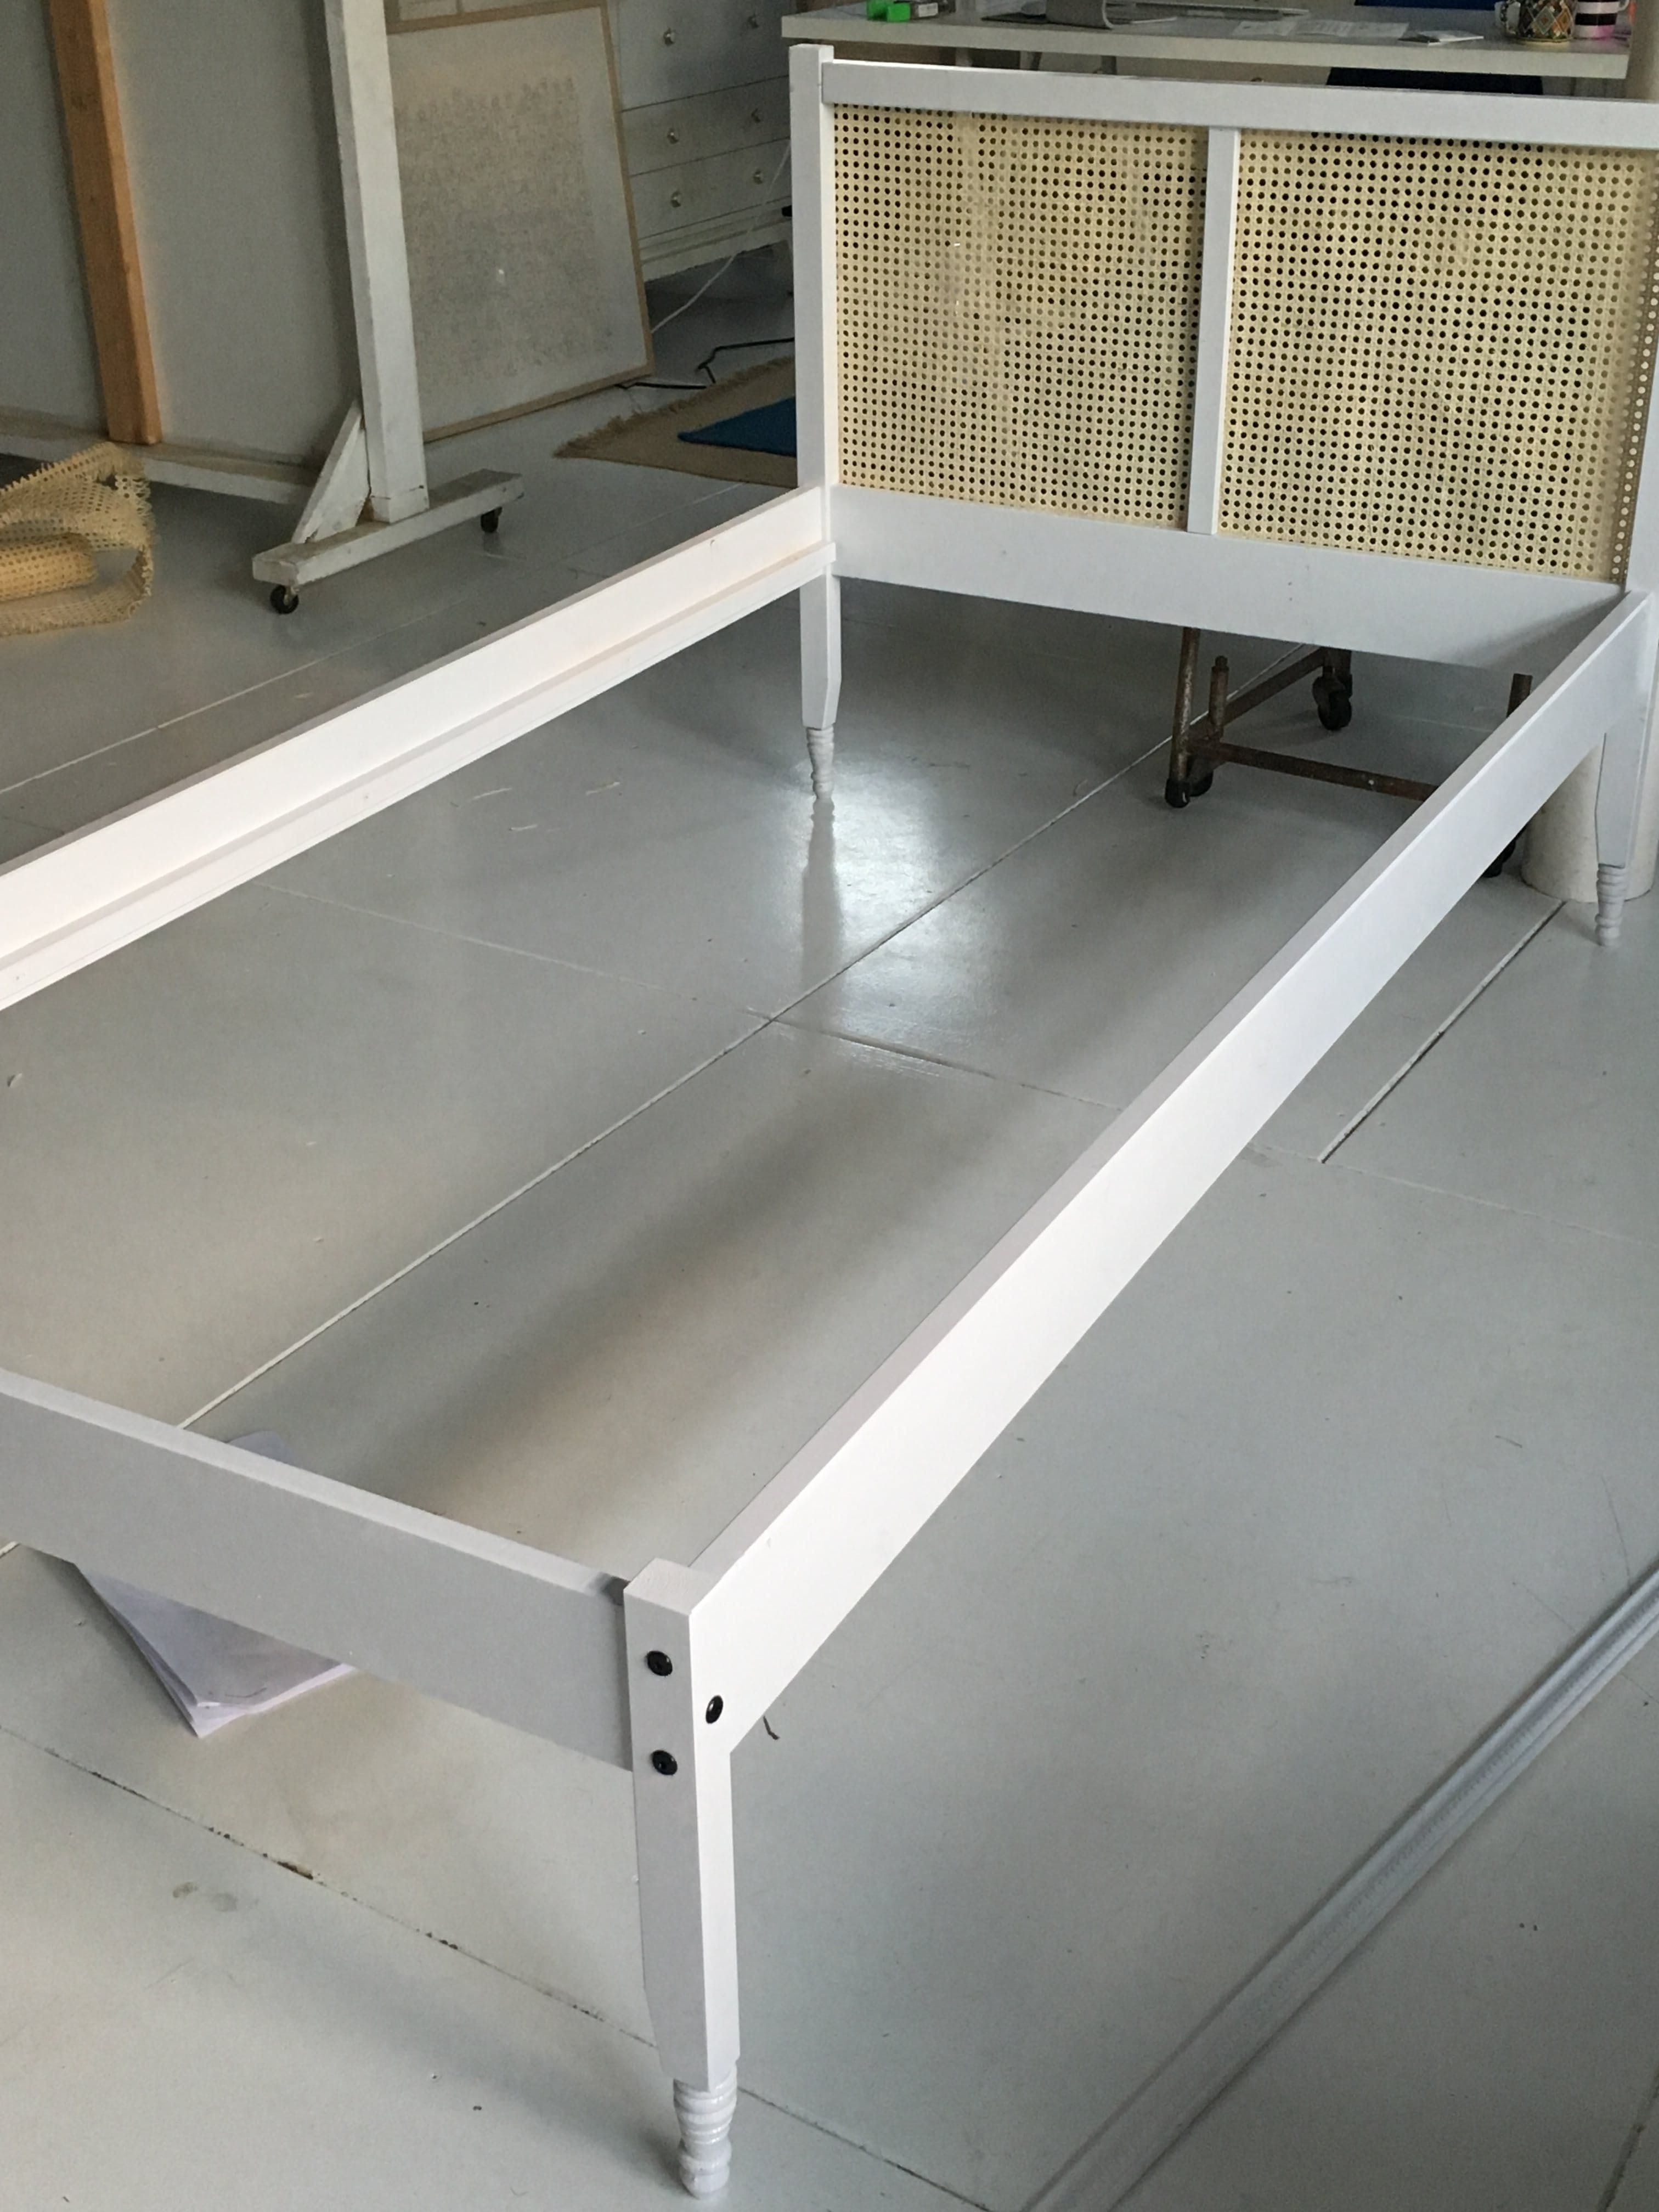 How To Seriously Upgrade A Basic 40 Ikea Fjellse Twin To A Beautiful Cane Bed Cane Bed Ikea Fjellse Ikea Bed Frames